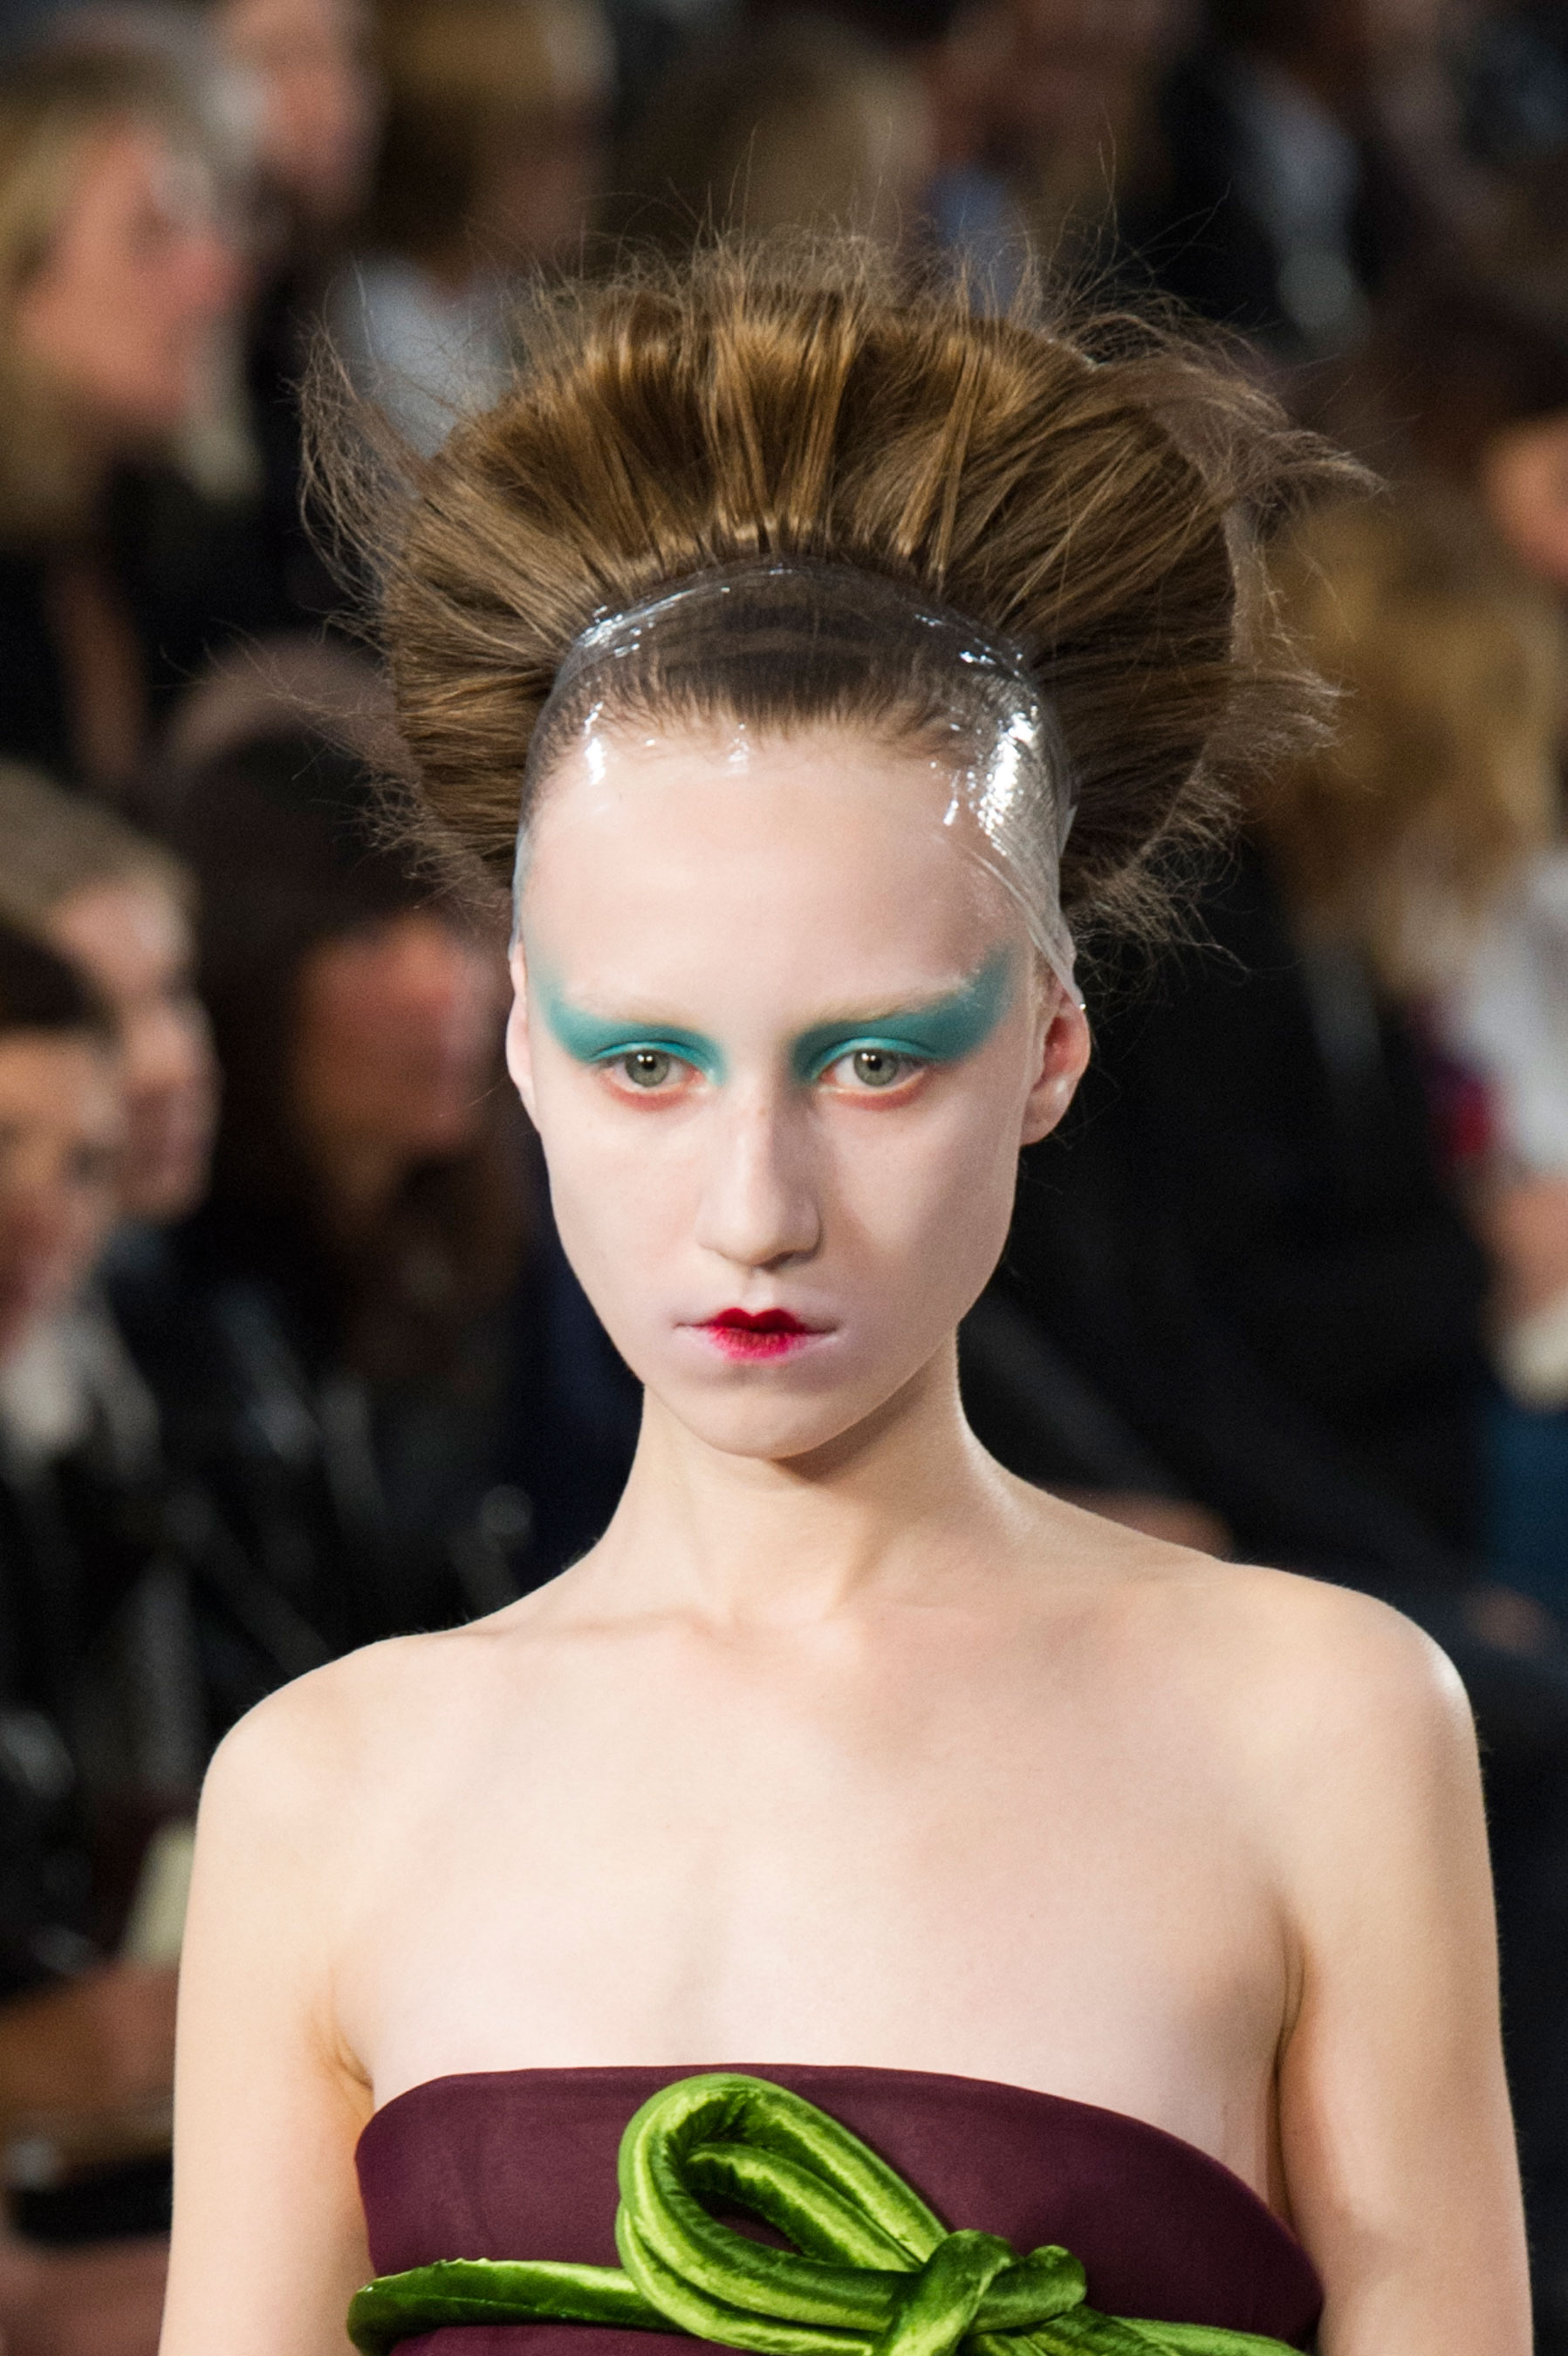 Maison-Margiela-spring-2016-runway-beauty-fashion-show-the-impression-105